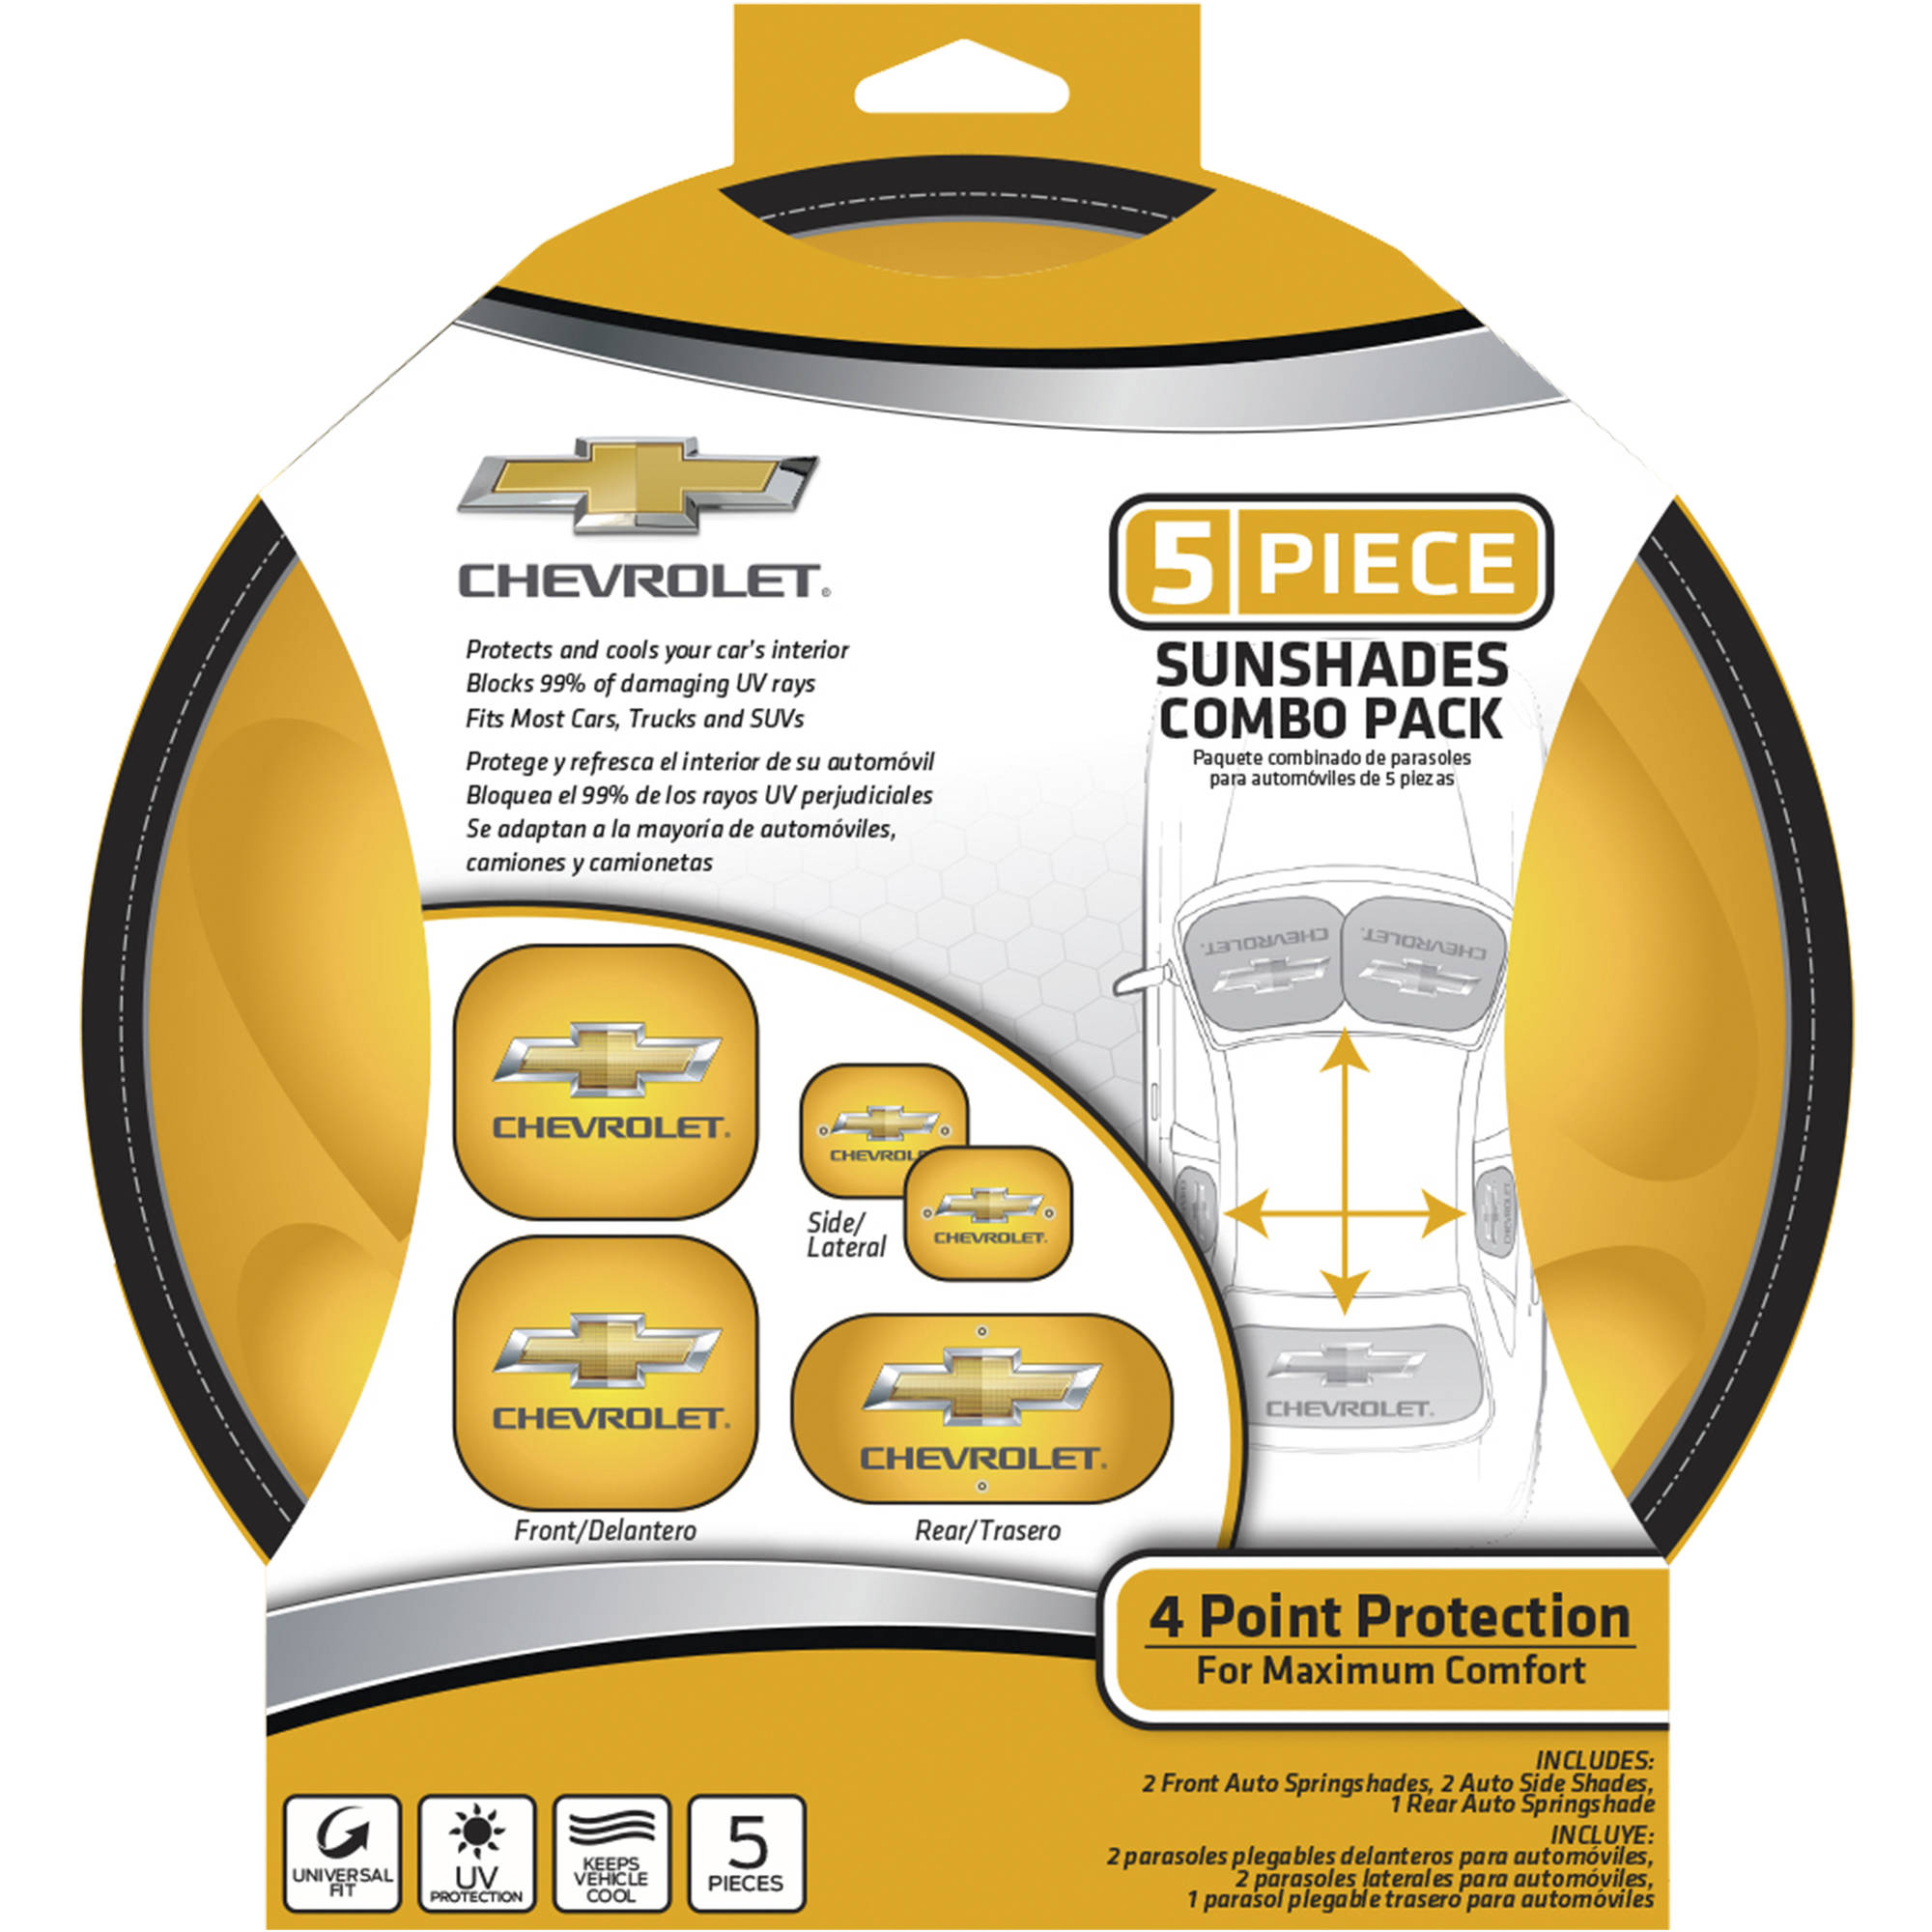 Chevy 5-piece Sunshade